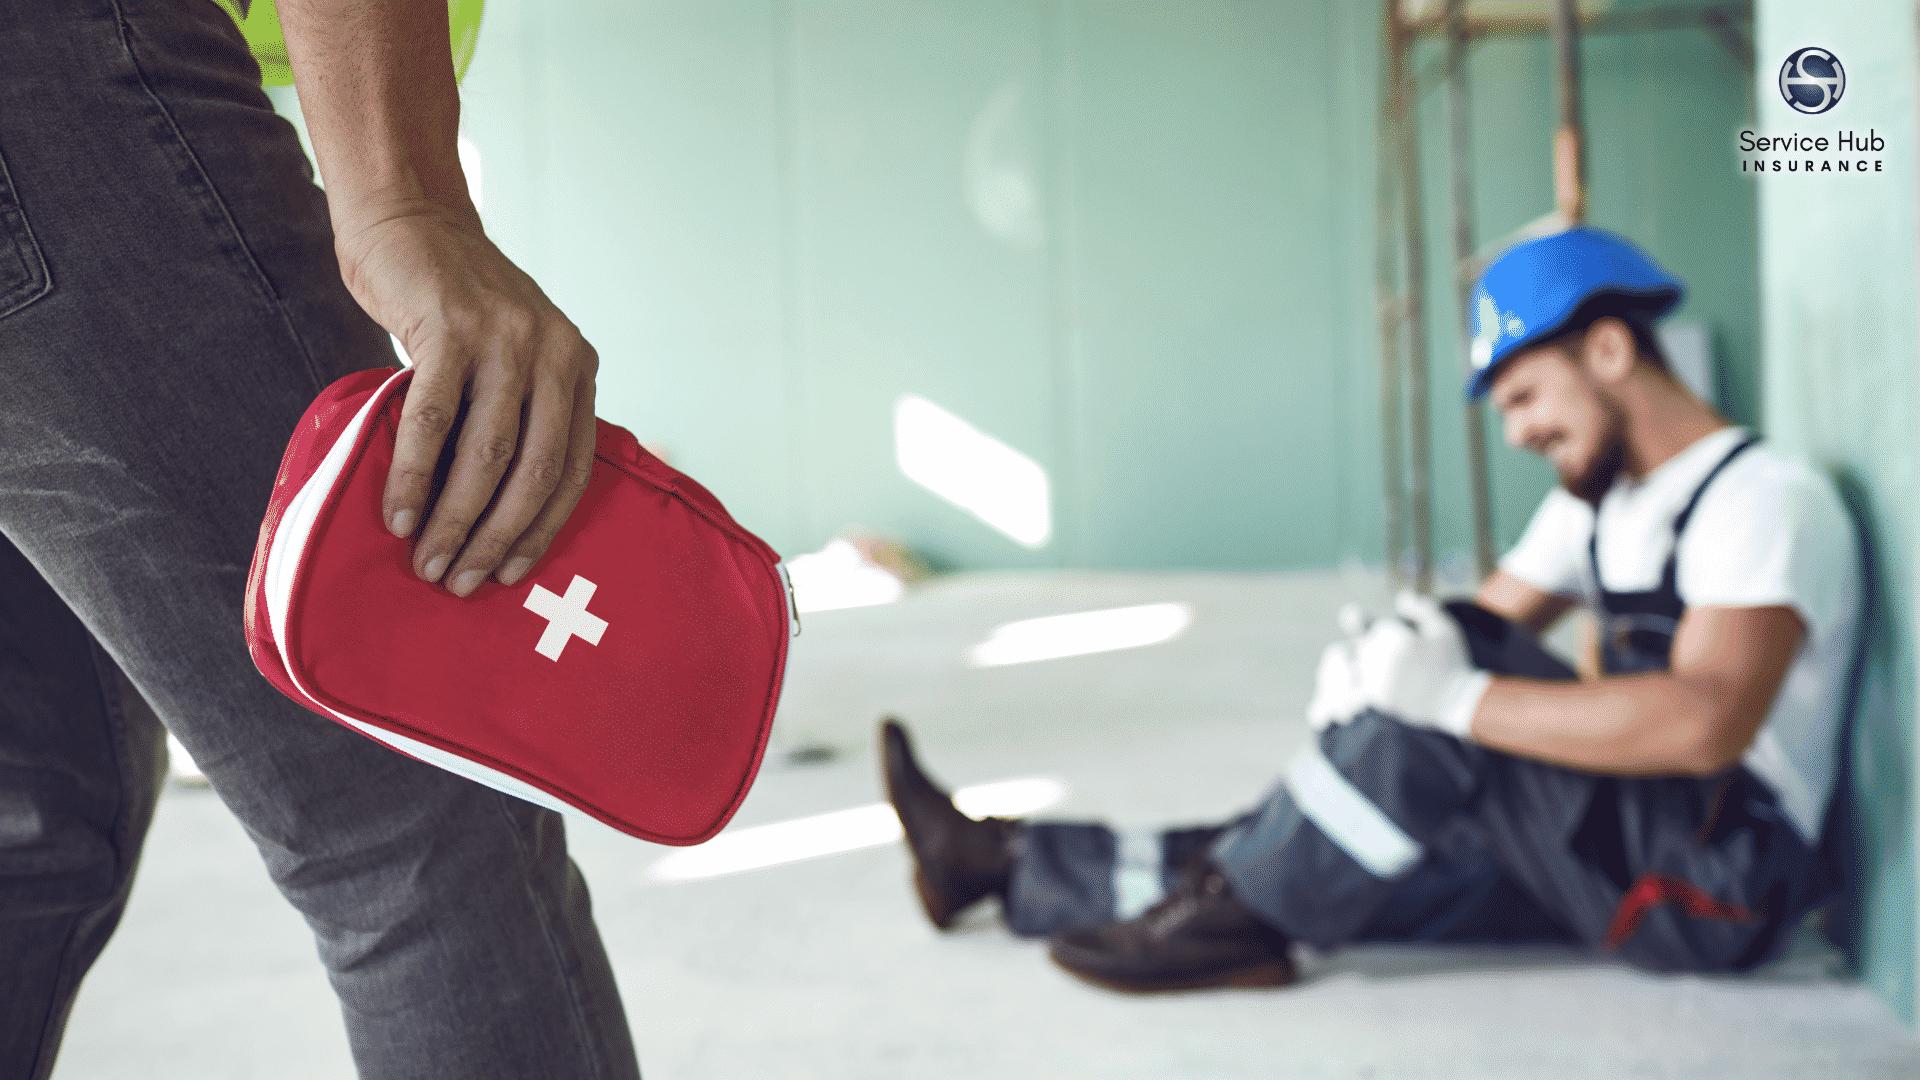 Accident Insurance - Service Hub Insurance